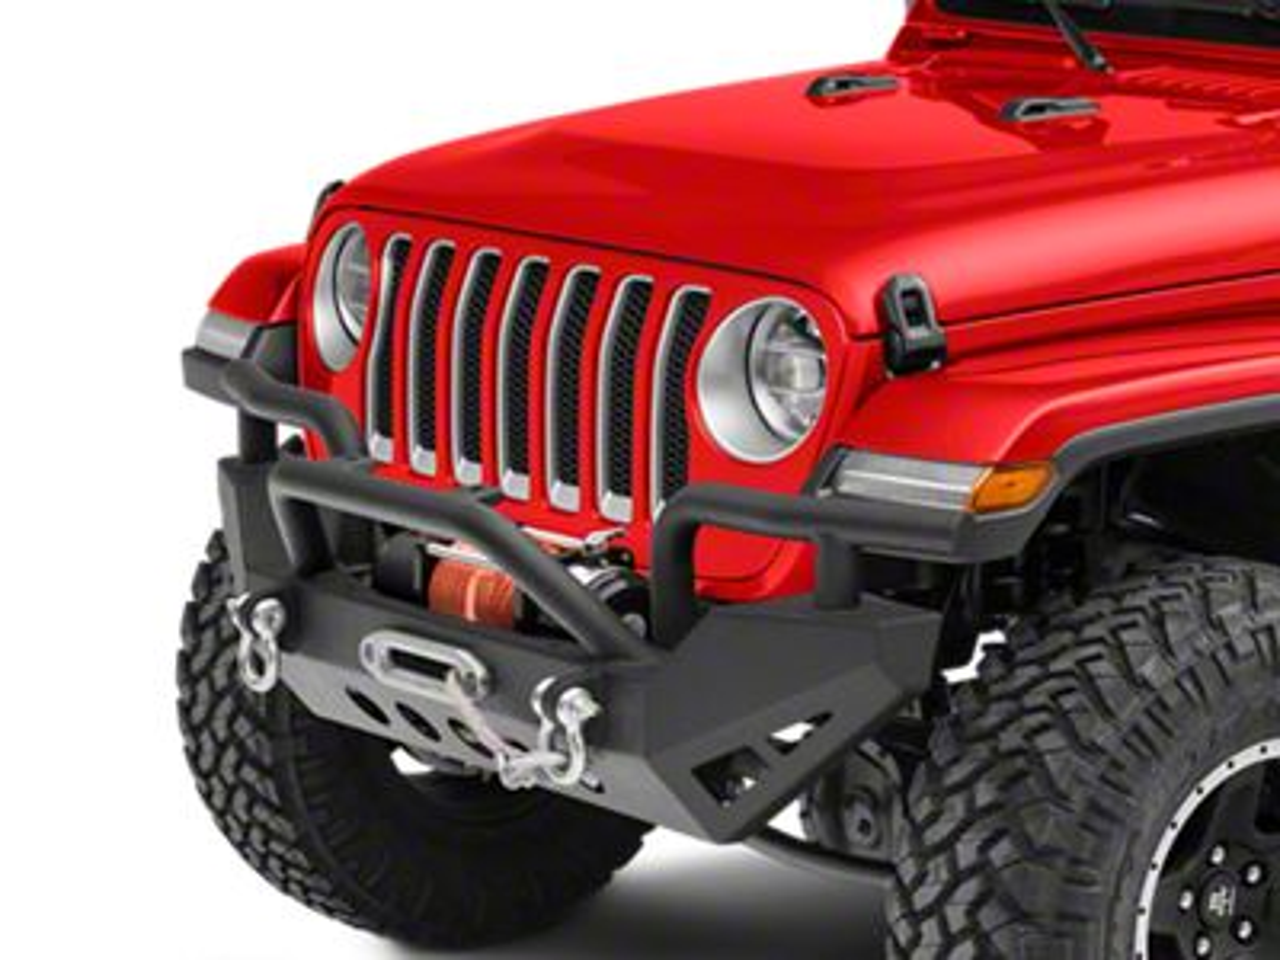 RedRock 4x4 Rock Crawler Full Width Front Bumper w/ Winch Mount (2018 Jeep Wrangler JL)